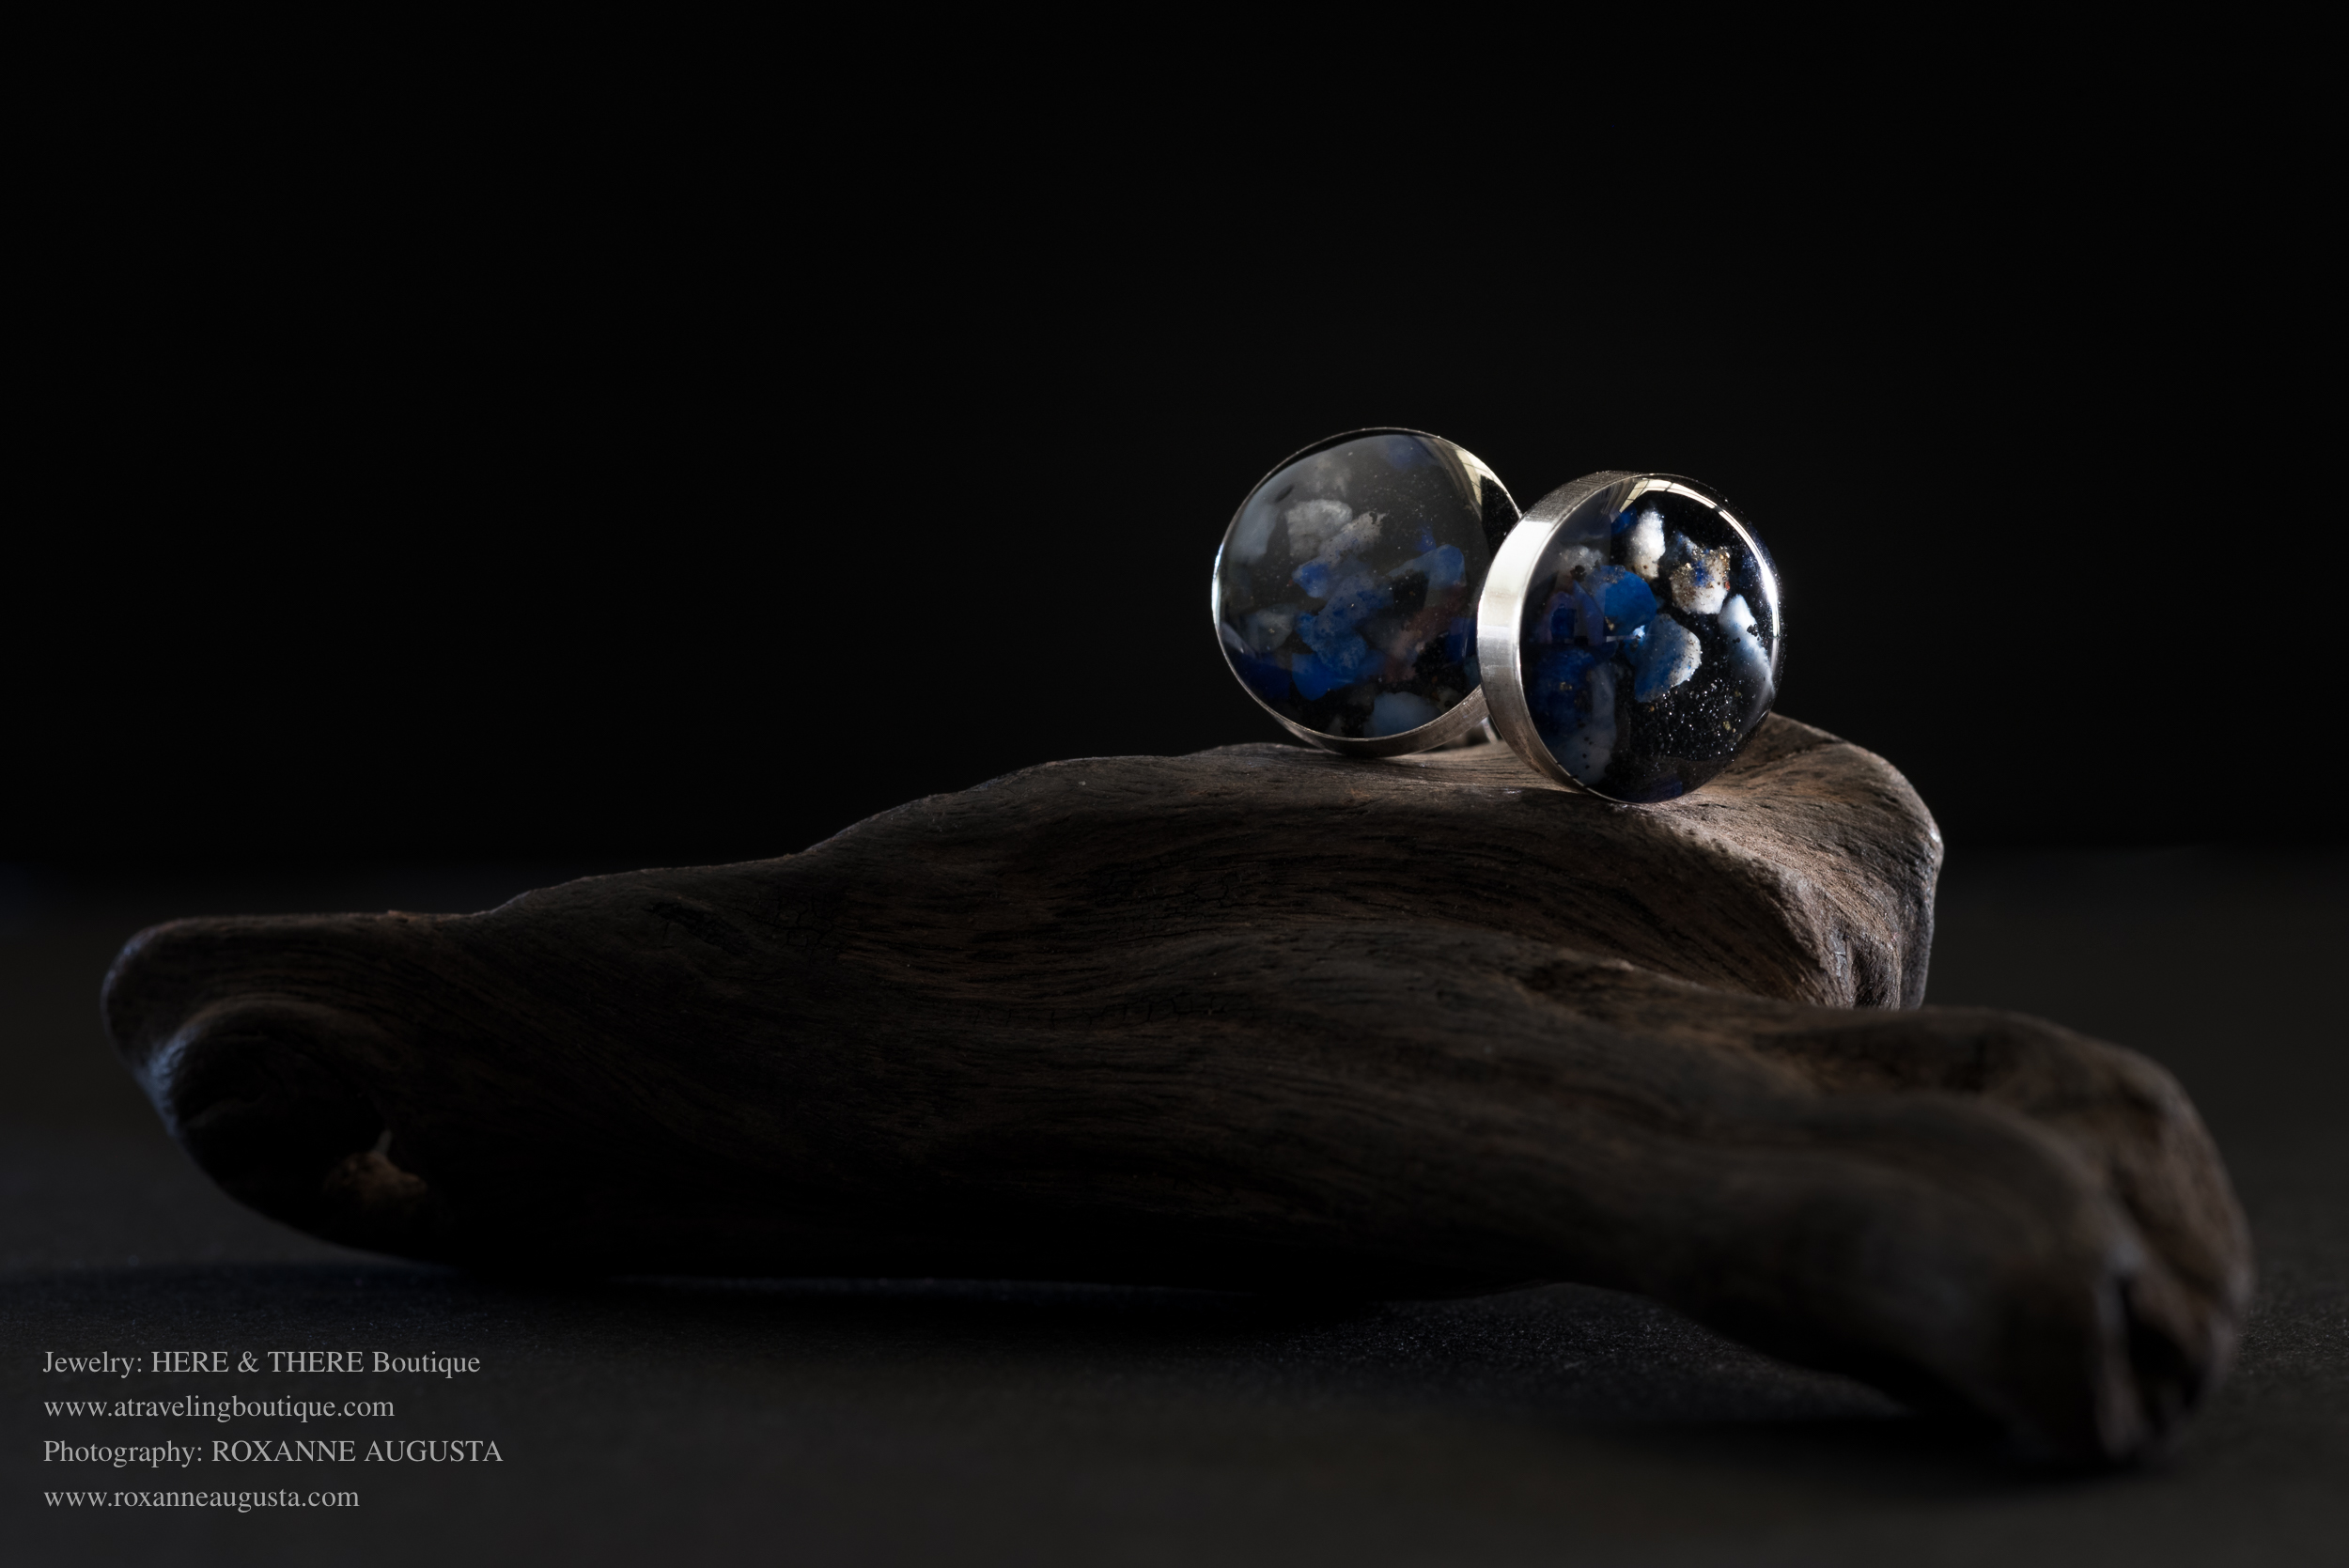 H&TJewelryProductPhotography-ROXANNEAUGUSTA-18.jpg